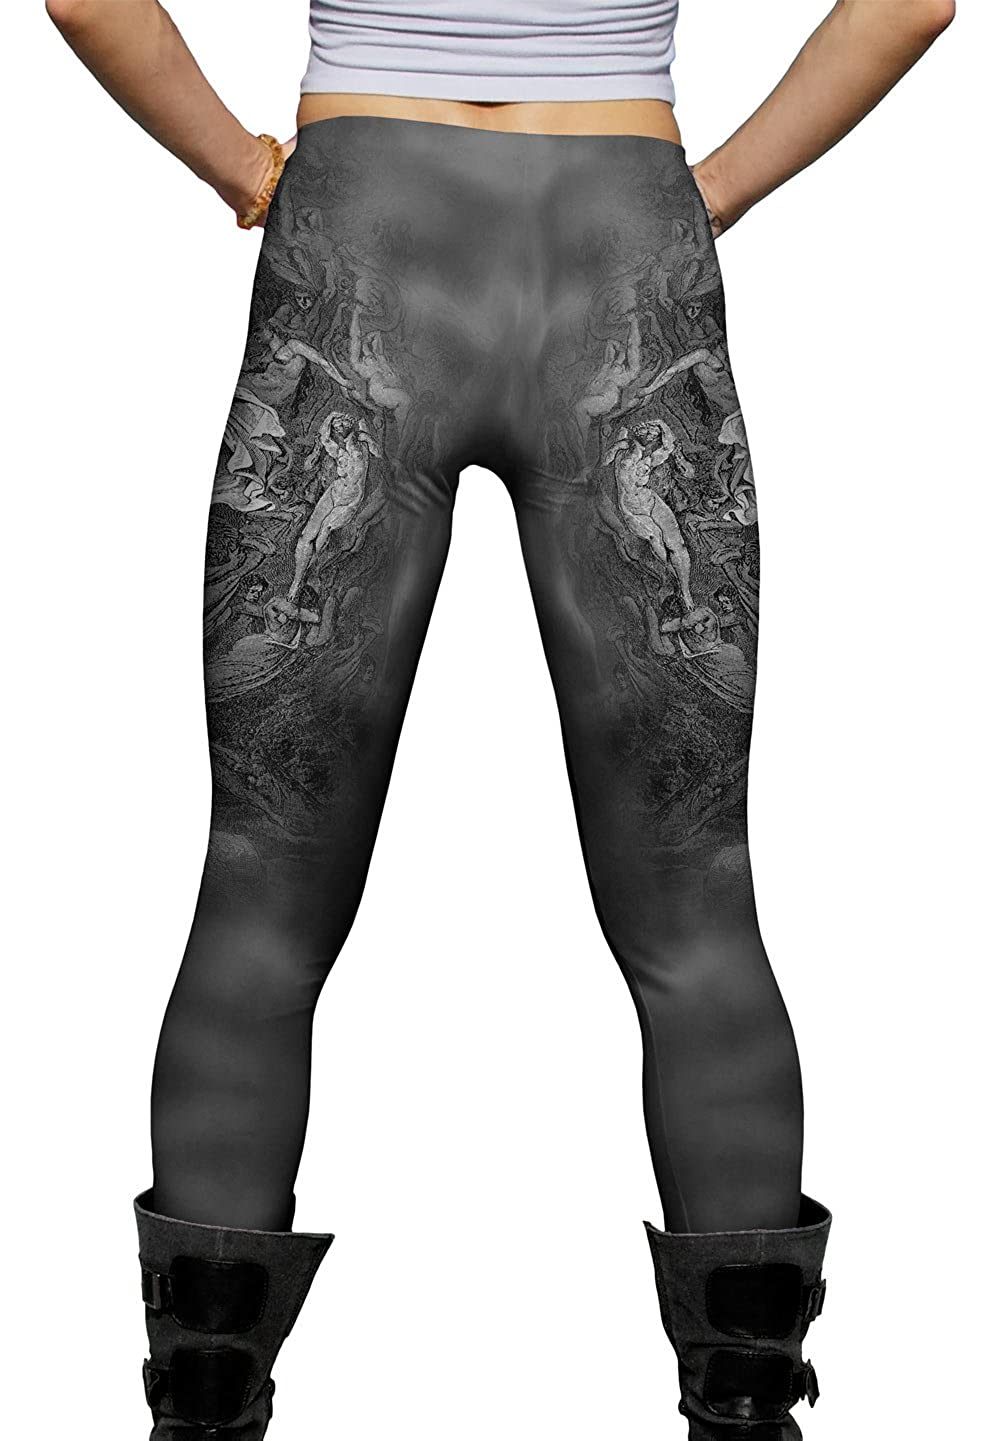 Dantes Inferno Dante -New Ladies Womens Leggings 2204 Yizzam Gustave Dore